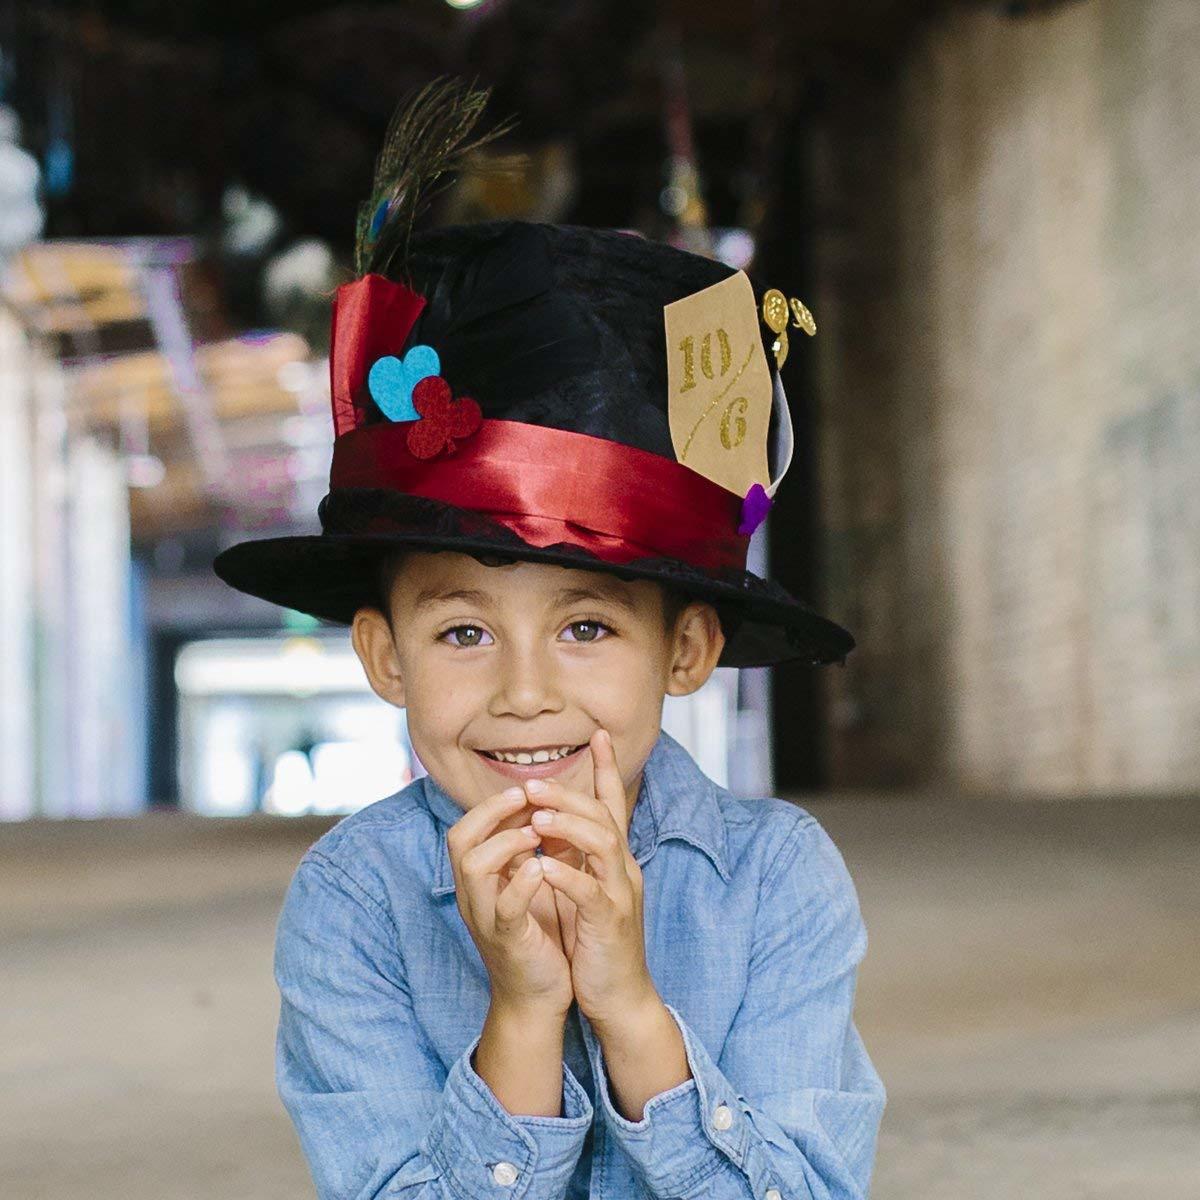 Disney's Alice: Design Your Own - Mad Hatter Hat image